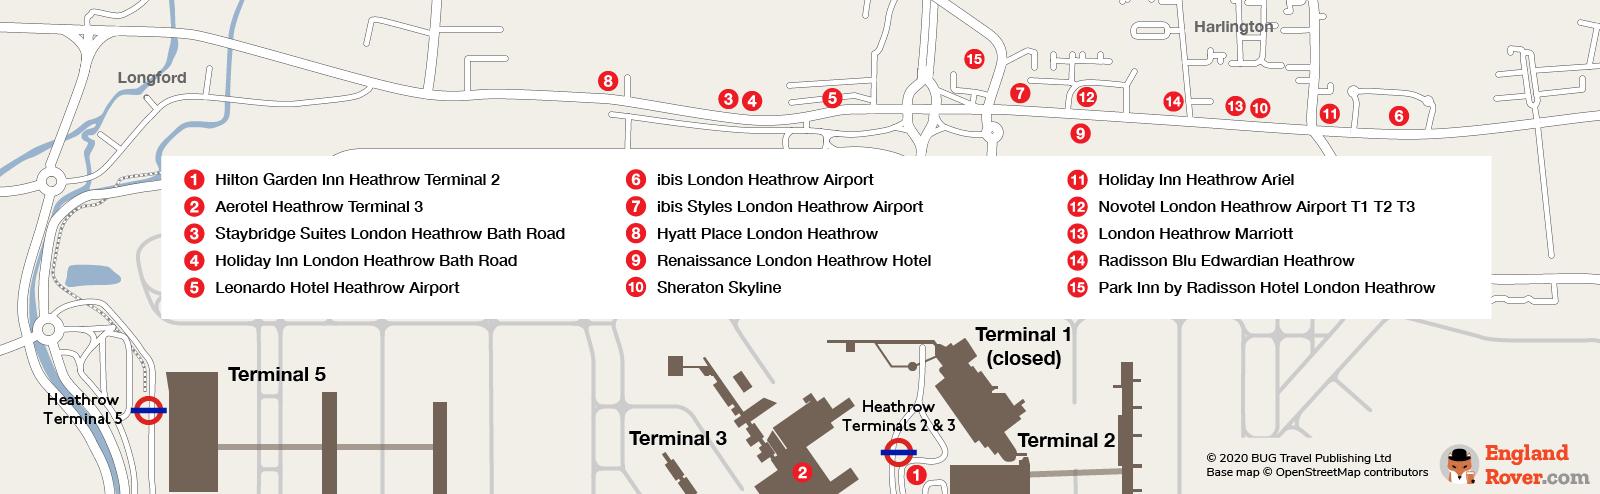 Heathrow Airport Terminals 2 & 3 hotels